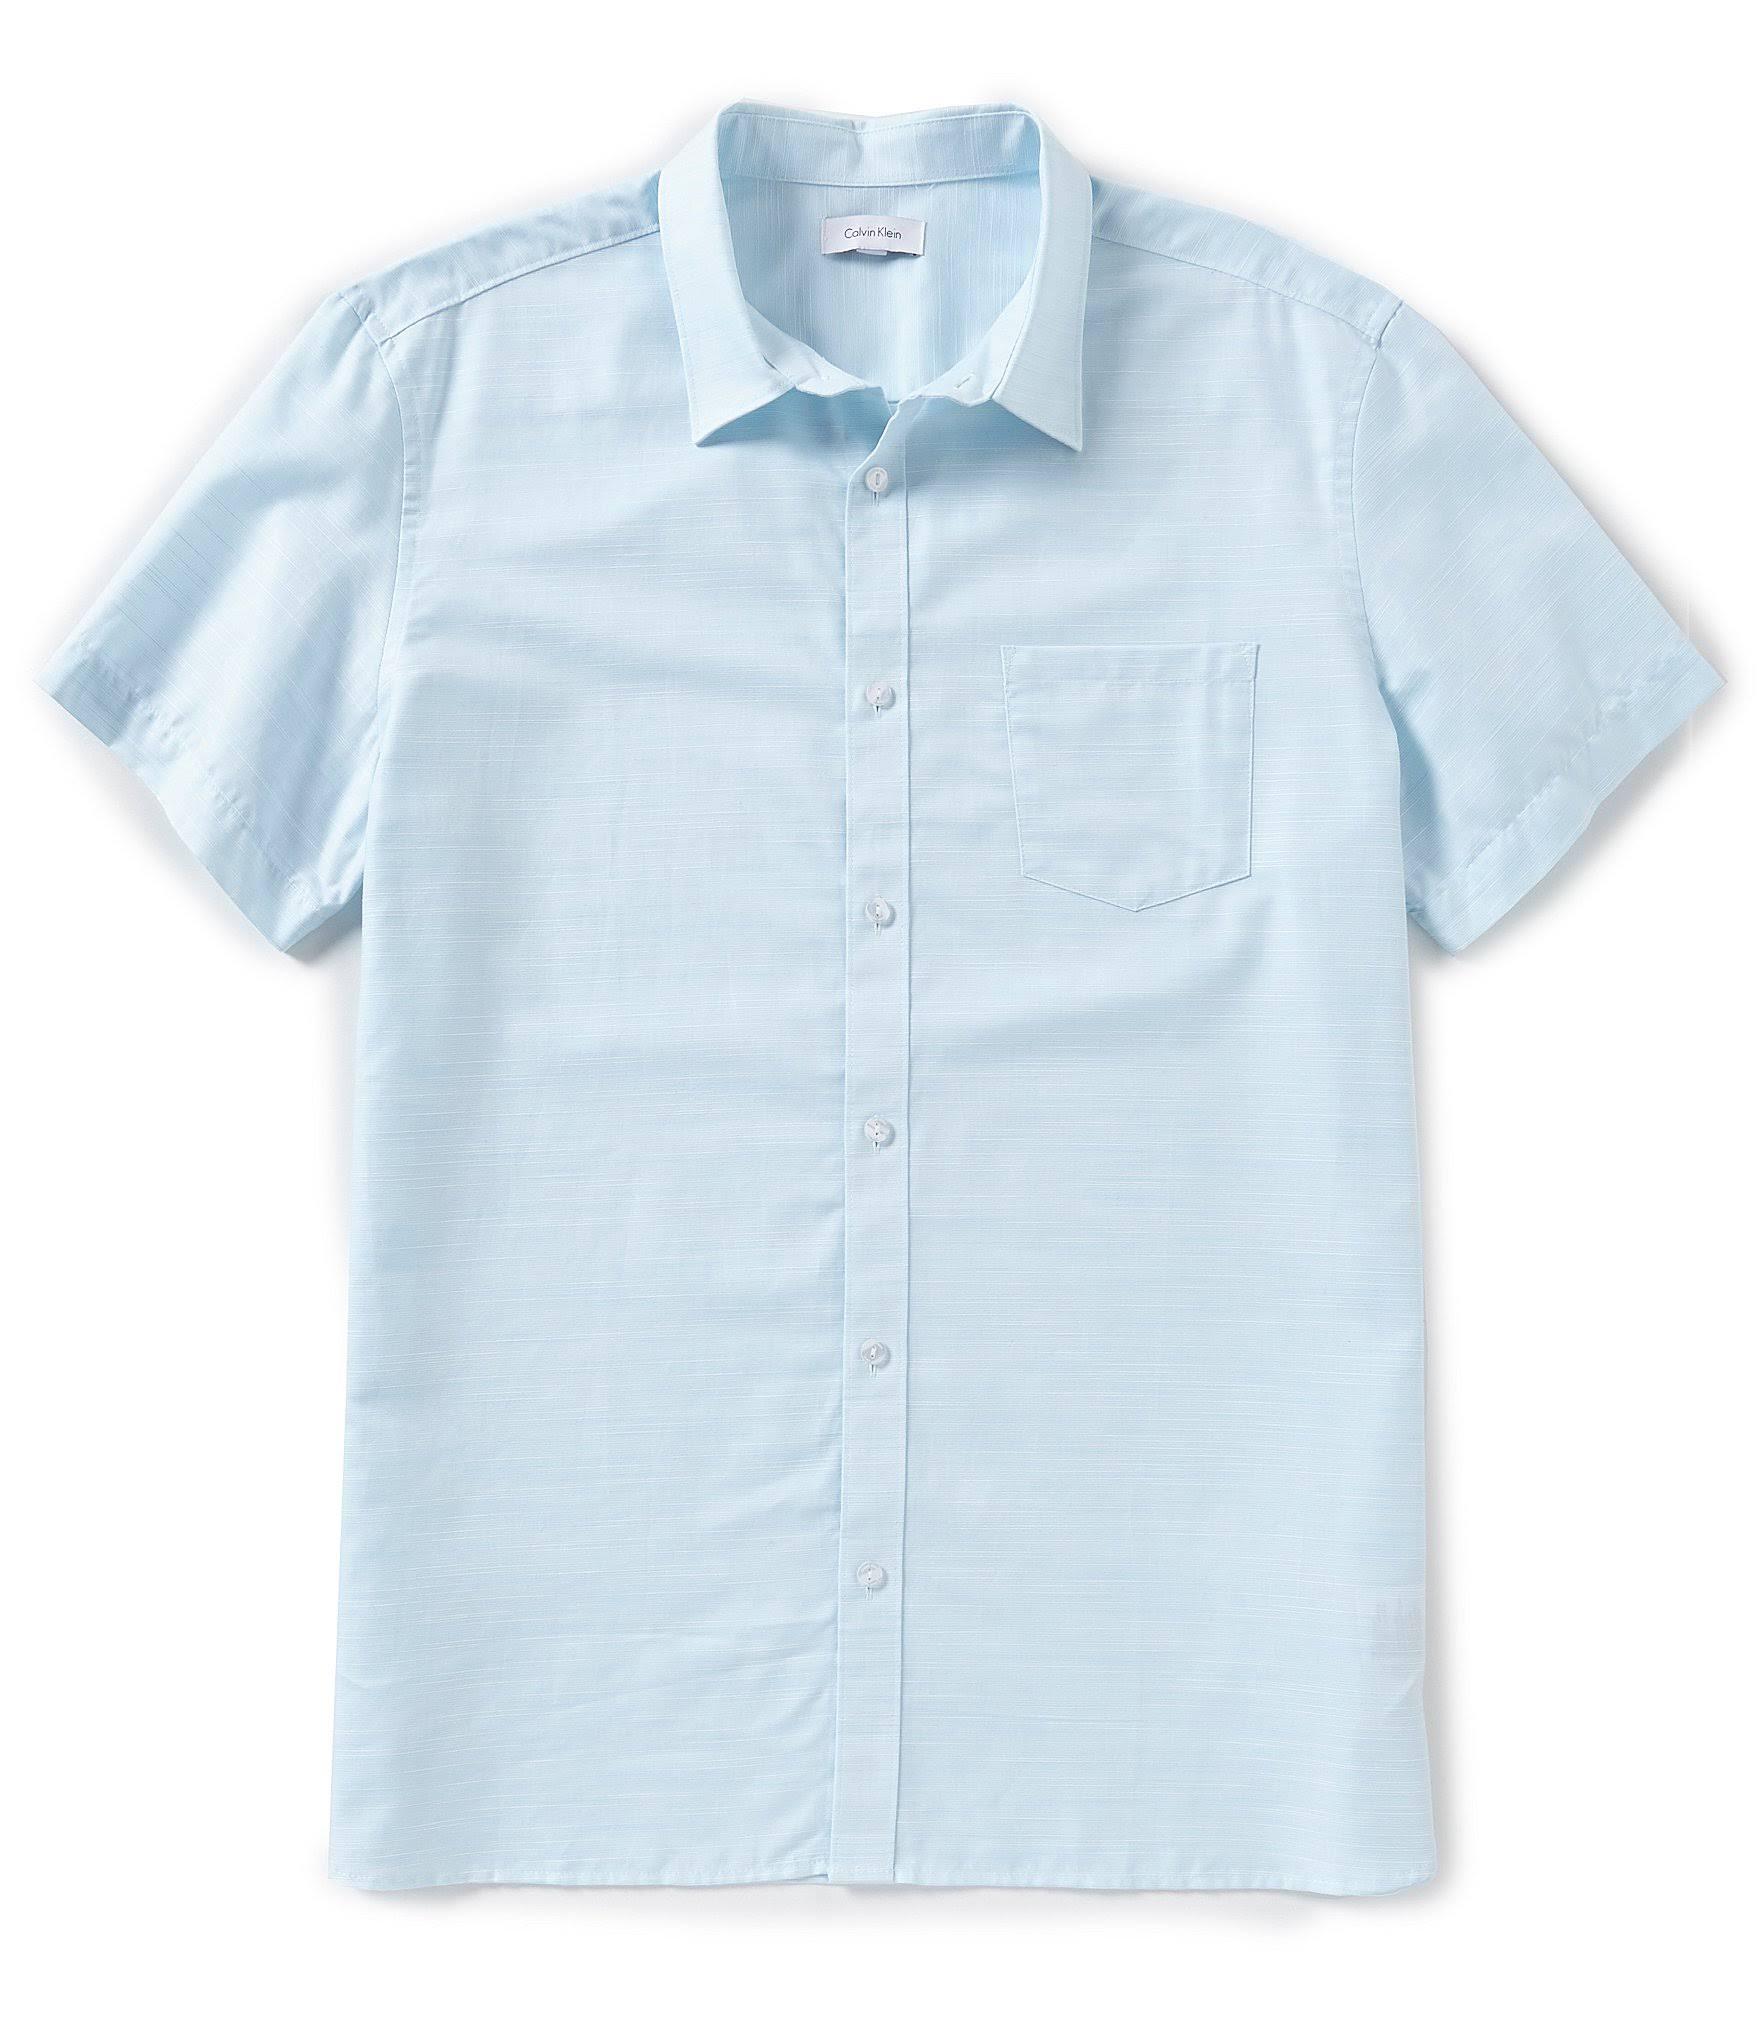 Topas Gewebtes Blauer Calvin Solides Kurzärmliges Hemd Klein M qxwxOYpt